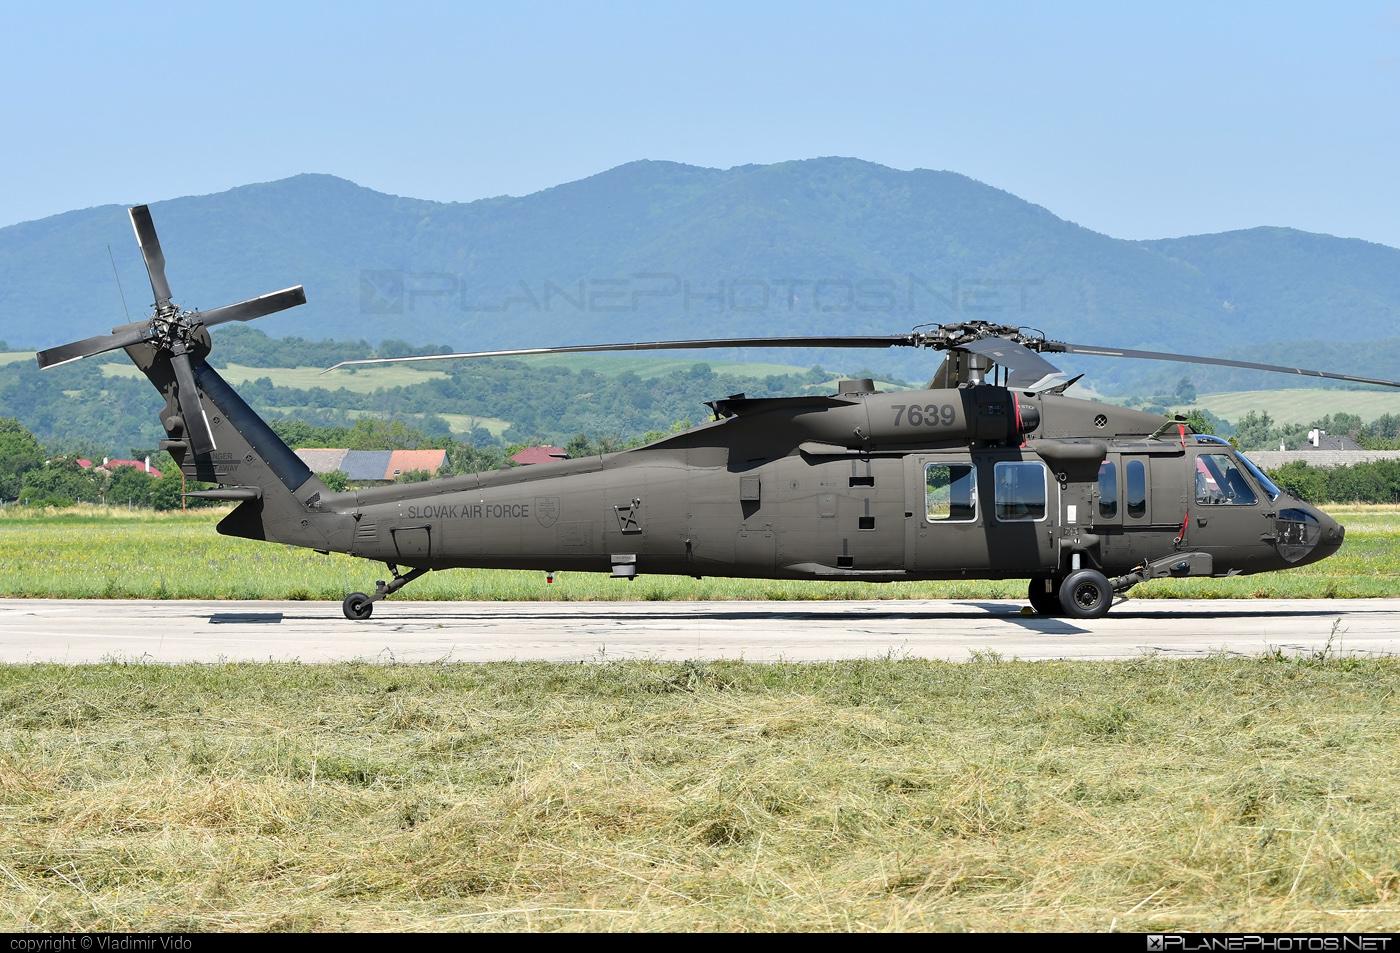 Sikorsky UH-60M Black Hawk - 7639 operated by Vzdušné sily OS SR (Slovak Air Force) #blackhawk #sikorsky #slovakairforce #uh60 #uh60blackhawk #uh60m #vzdusnesilyossr